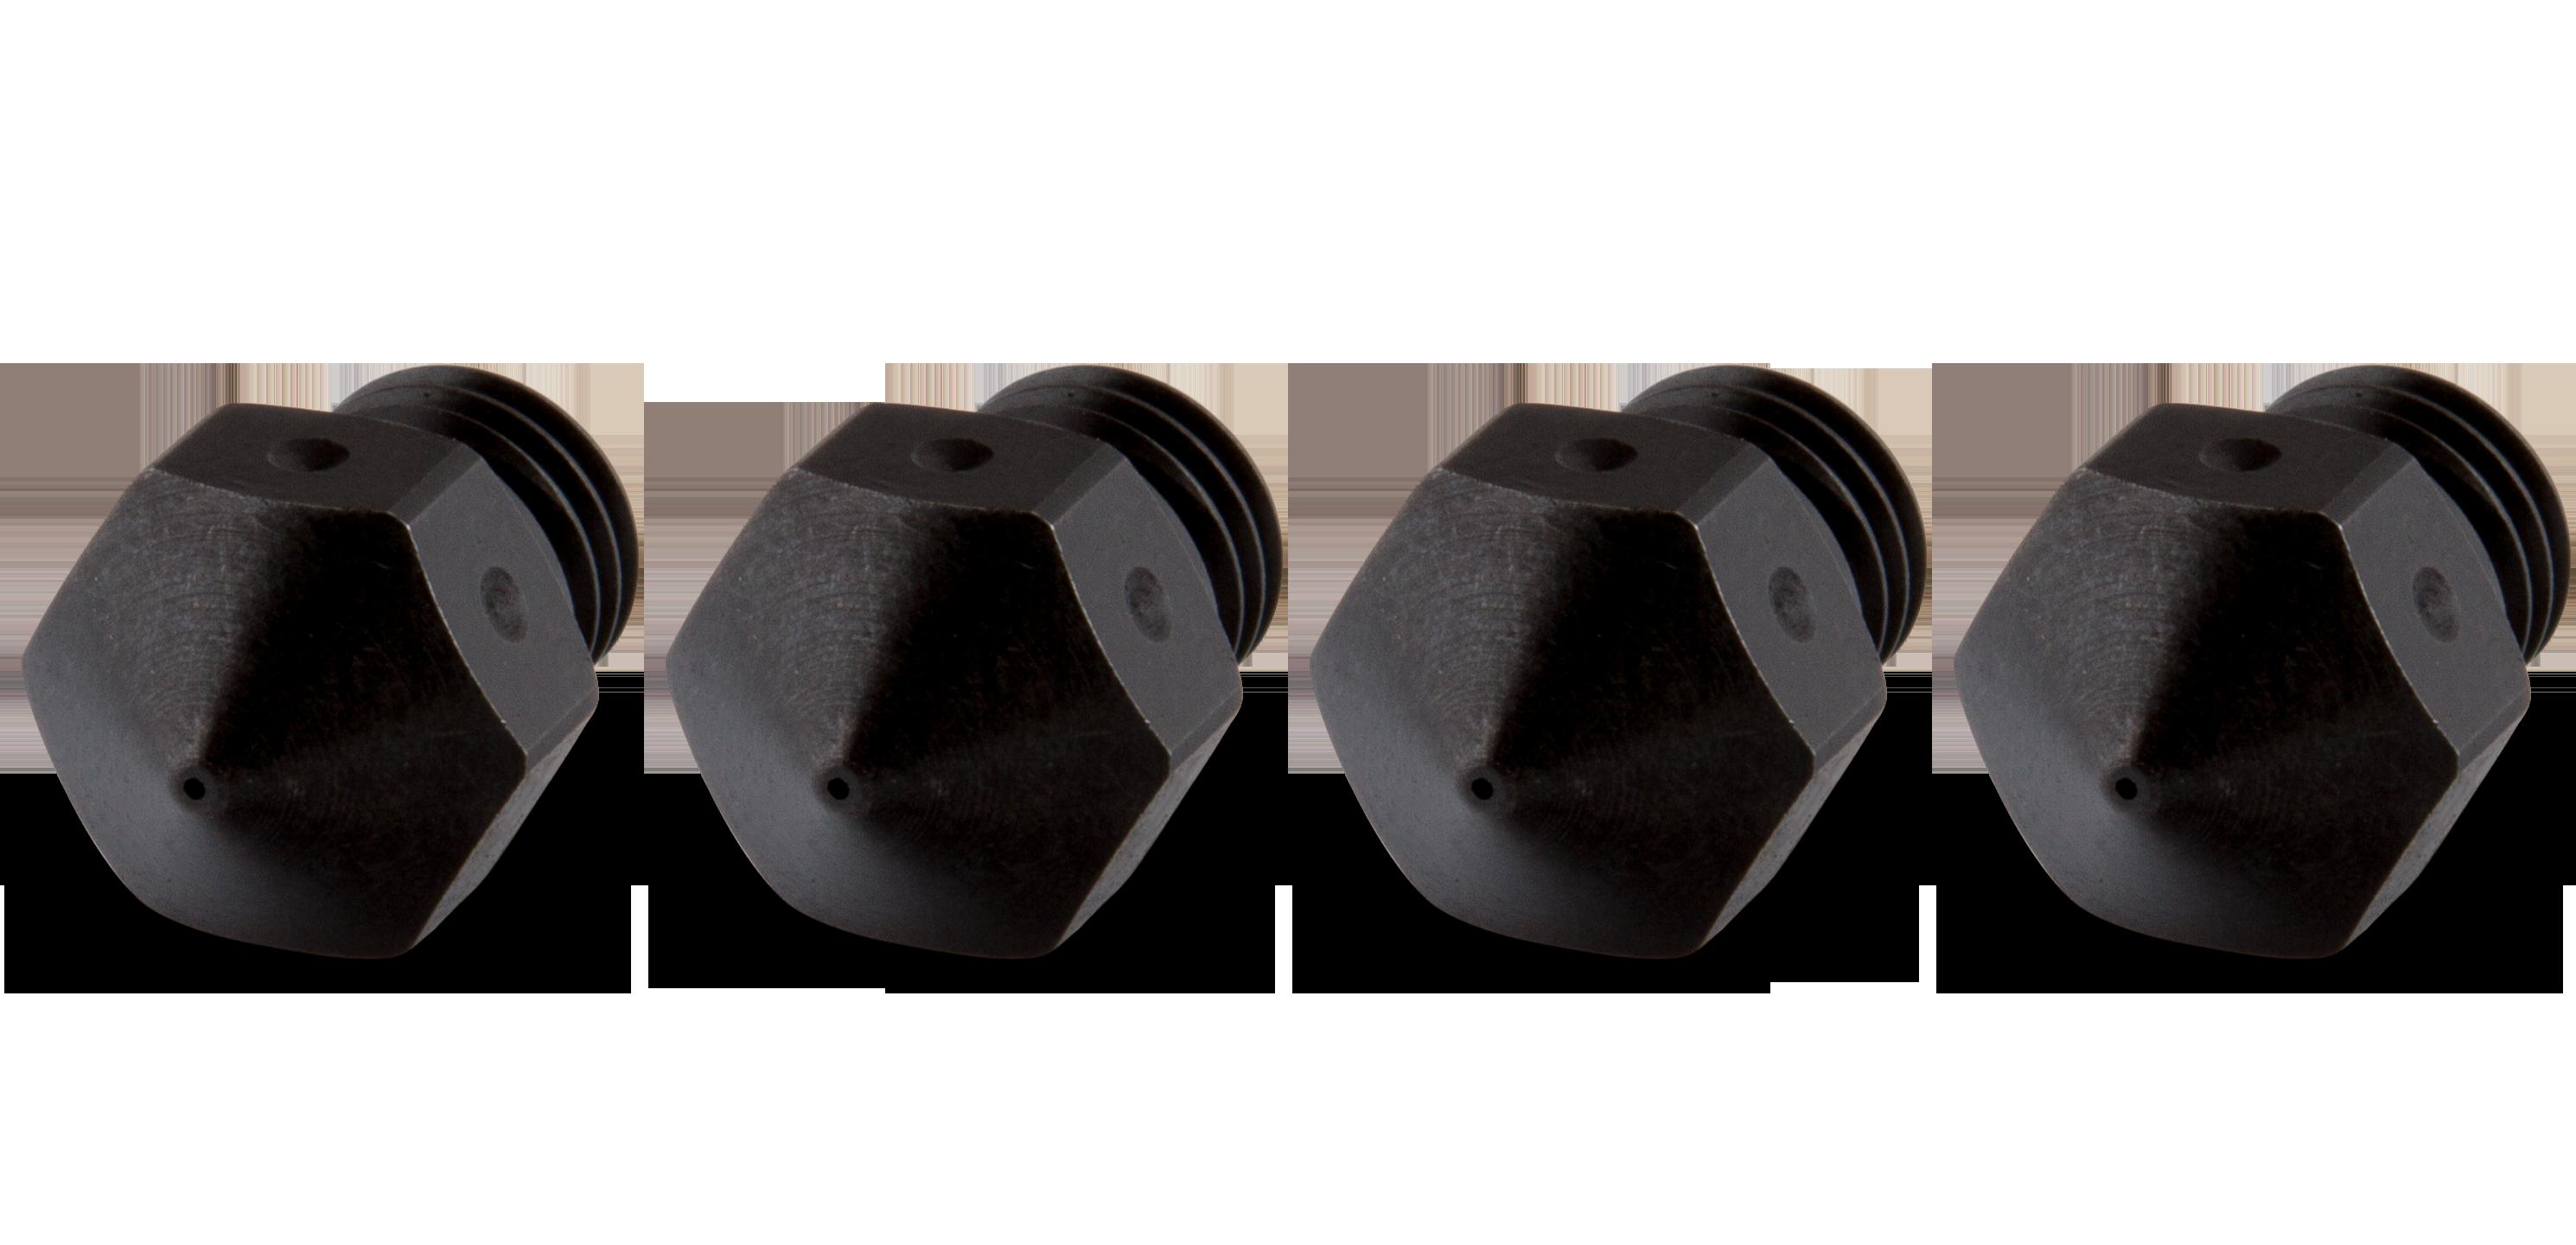 PrimaCreator PC-NVP-MK10 Nozzle